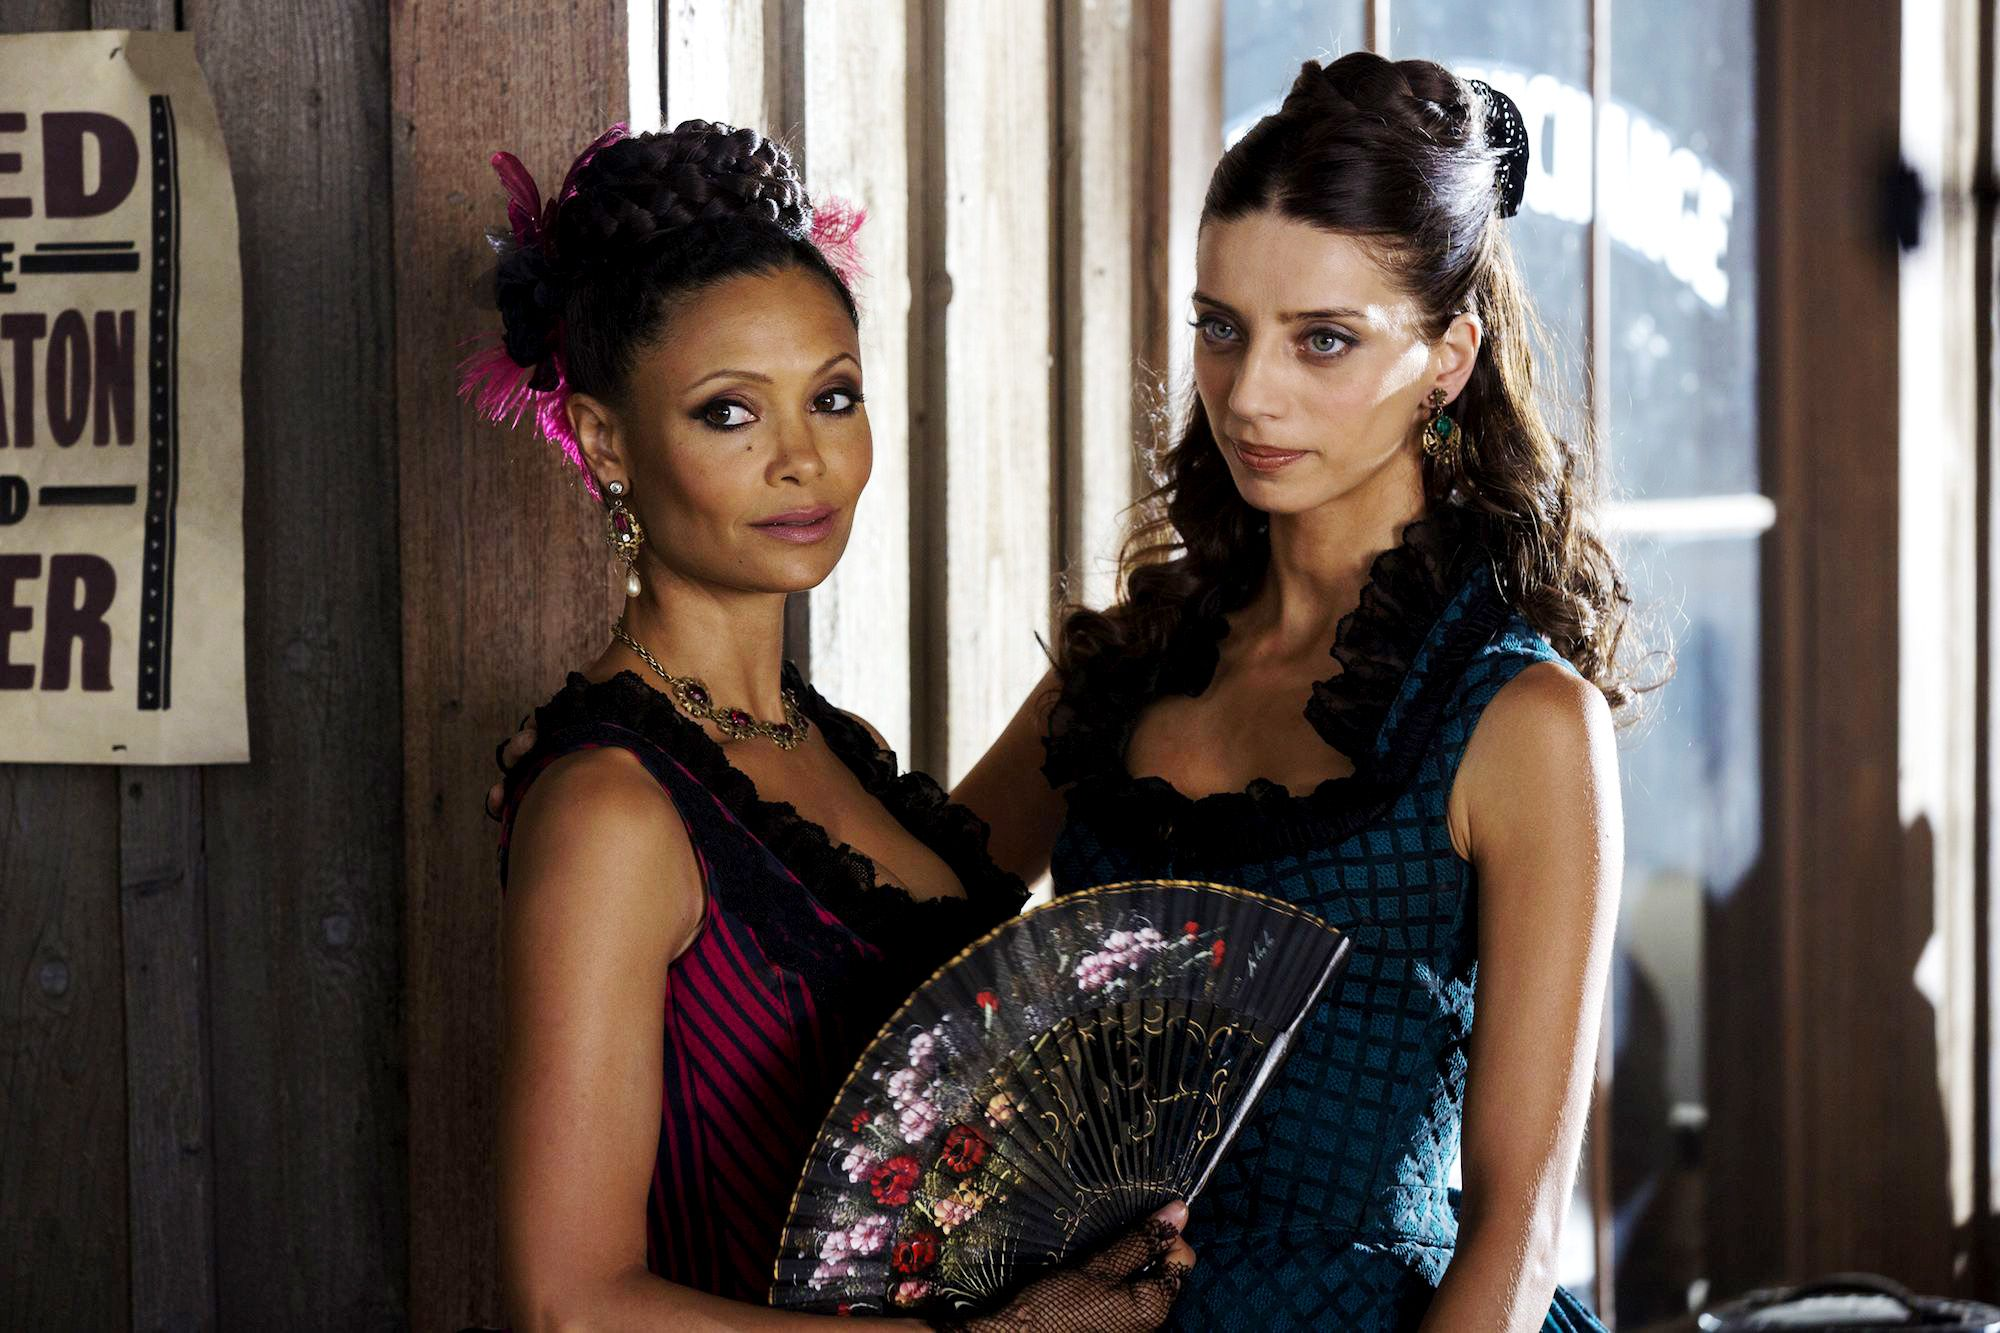 Westworld Season 2 Soundtrack Guide - Westworld Season 2 Music Gives